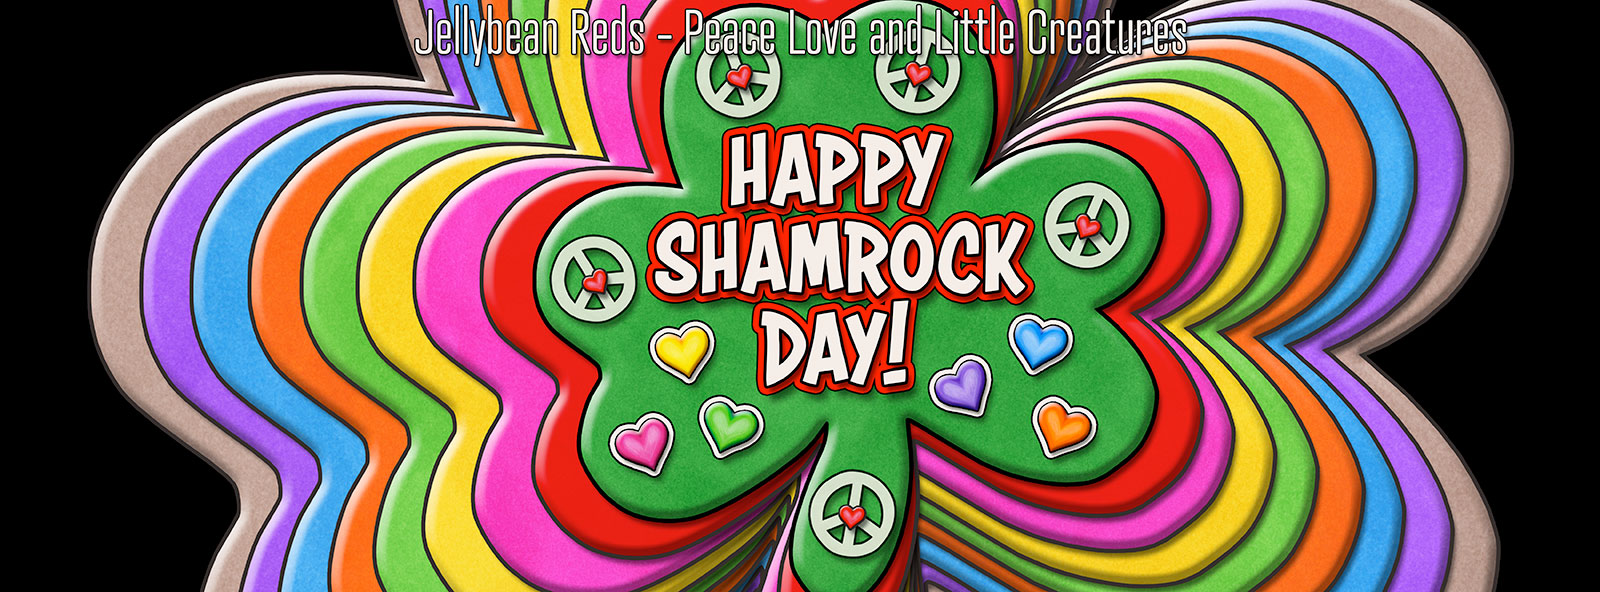 Happy Shamrock Day - Rainbow Shamrocks with Peace Signs and Hearts